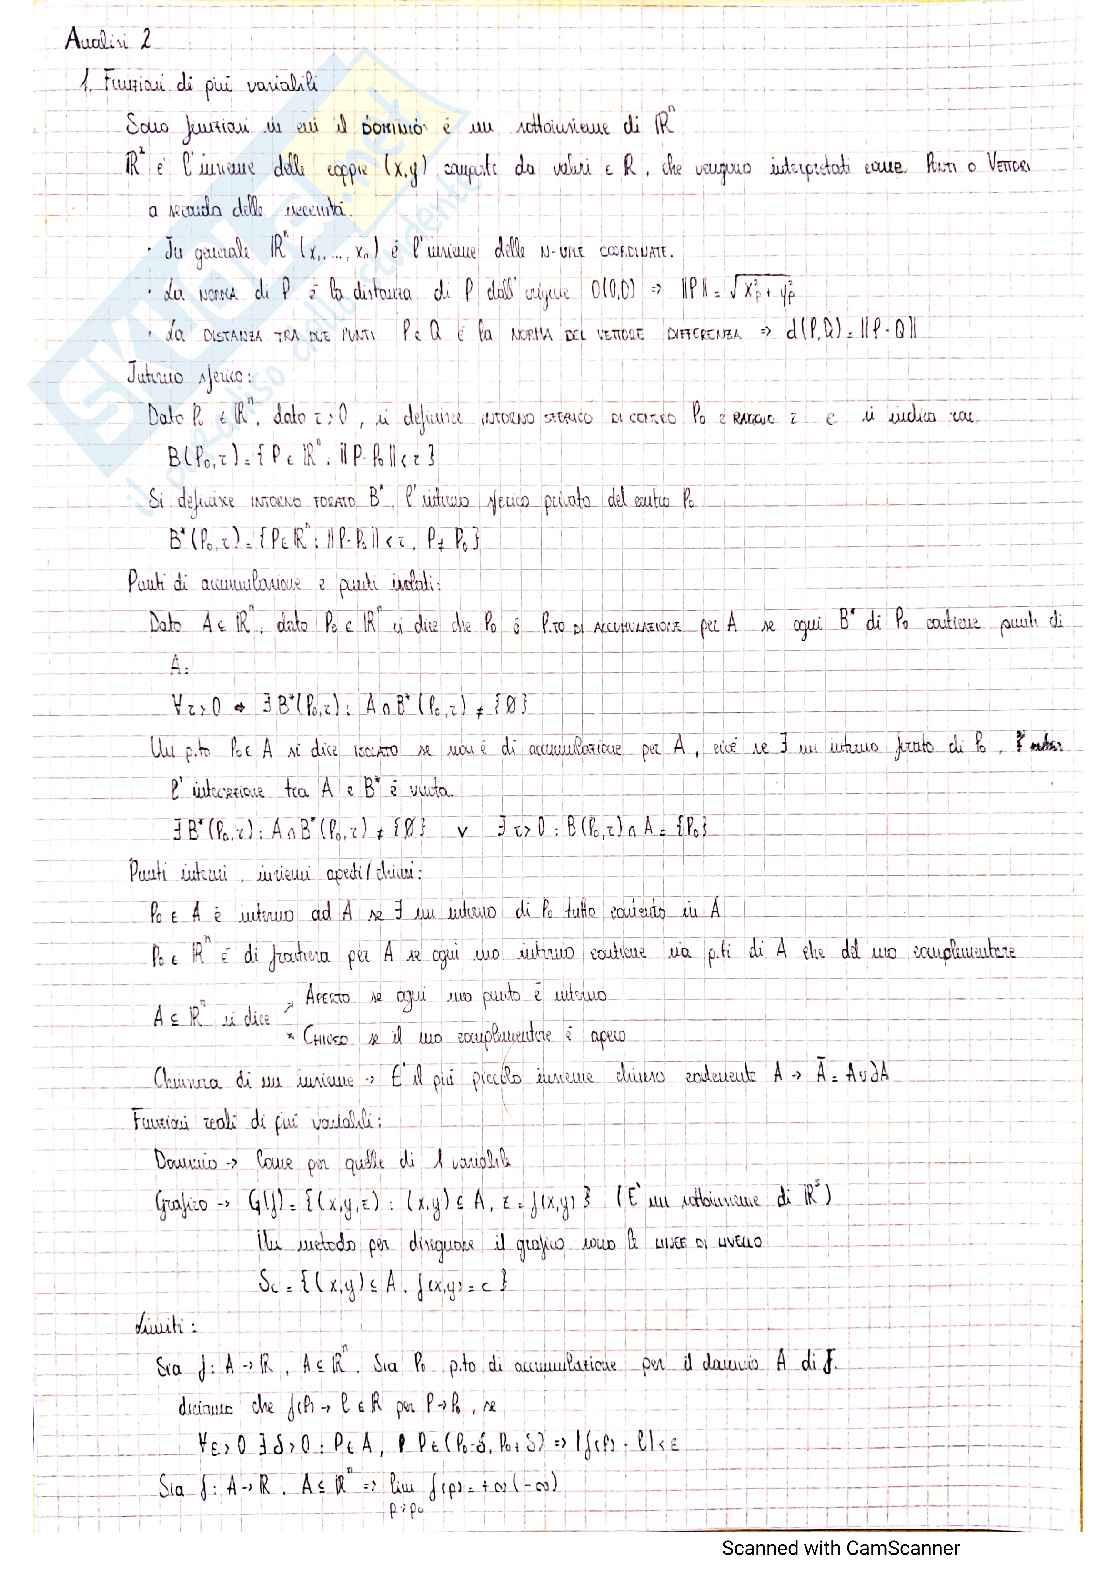 Appunti completi Analisi 2